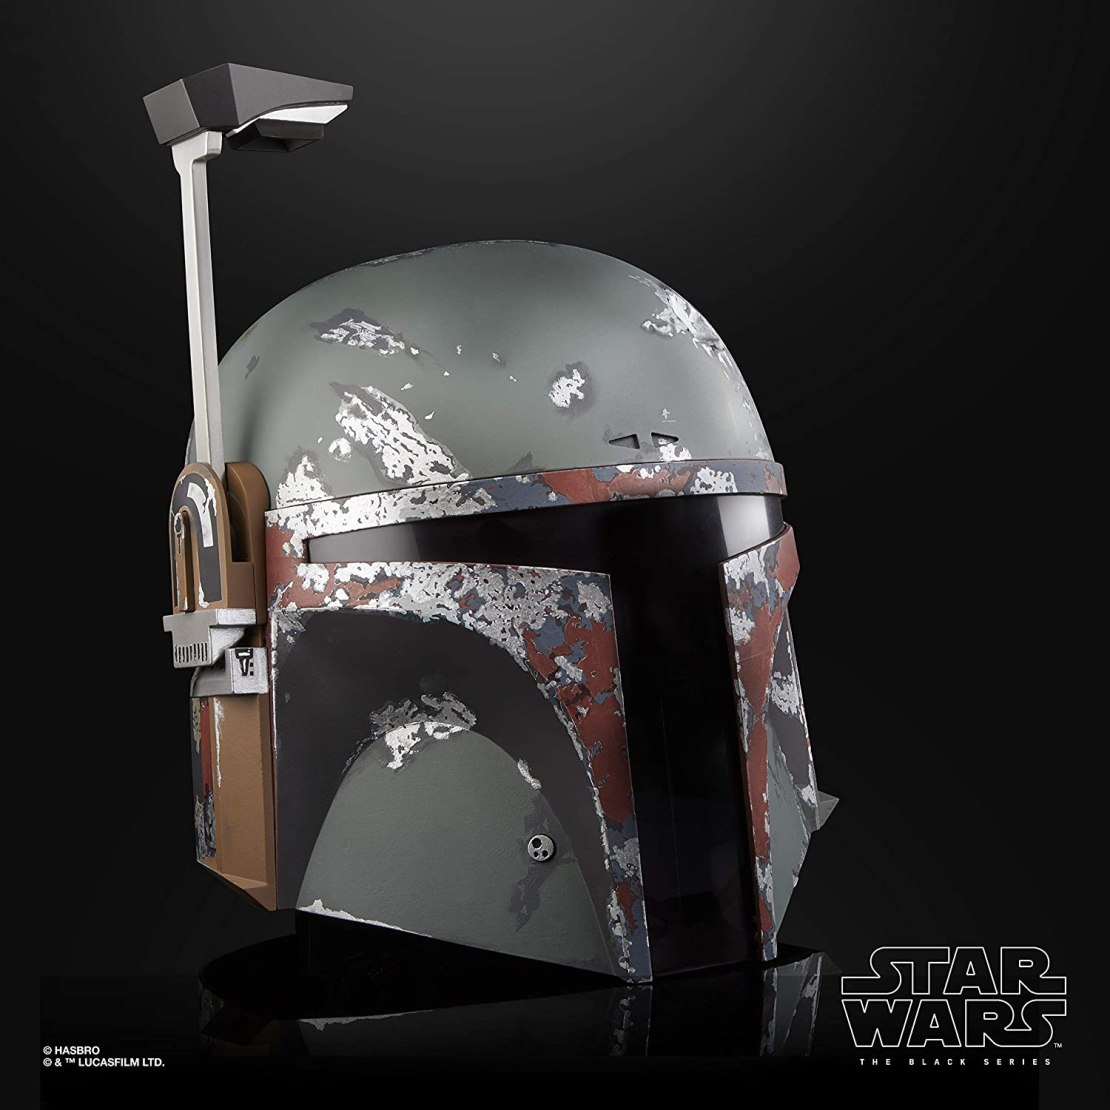 STAR WARS The Black Series Boba Fett Premium Electronic Helmet, The Empire Strikes Back